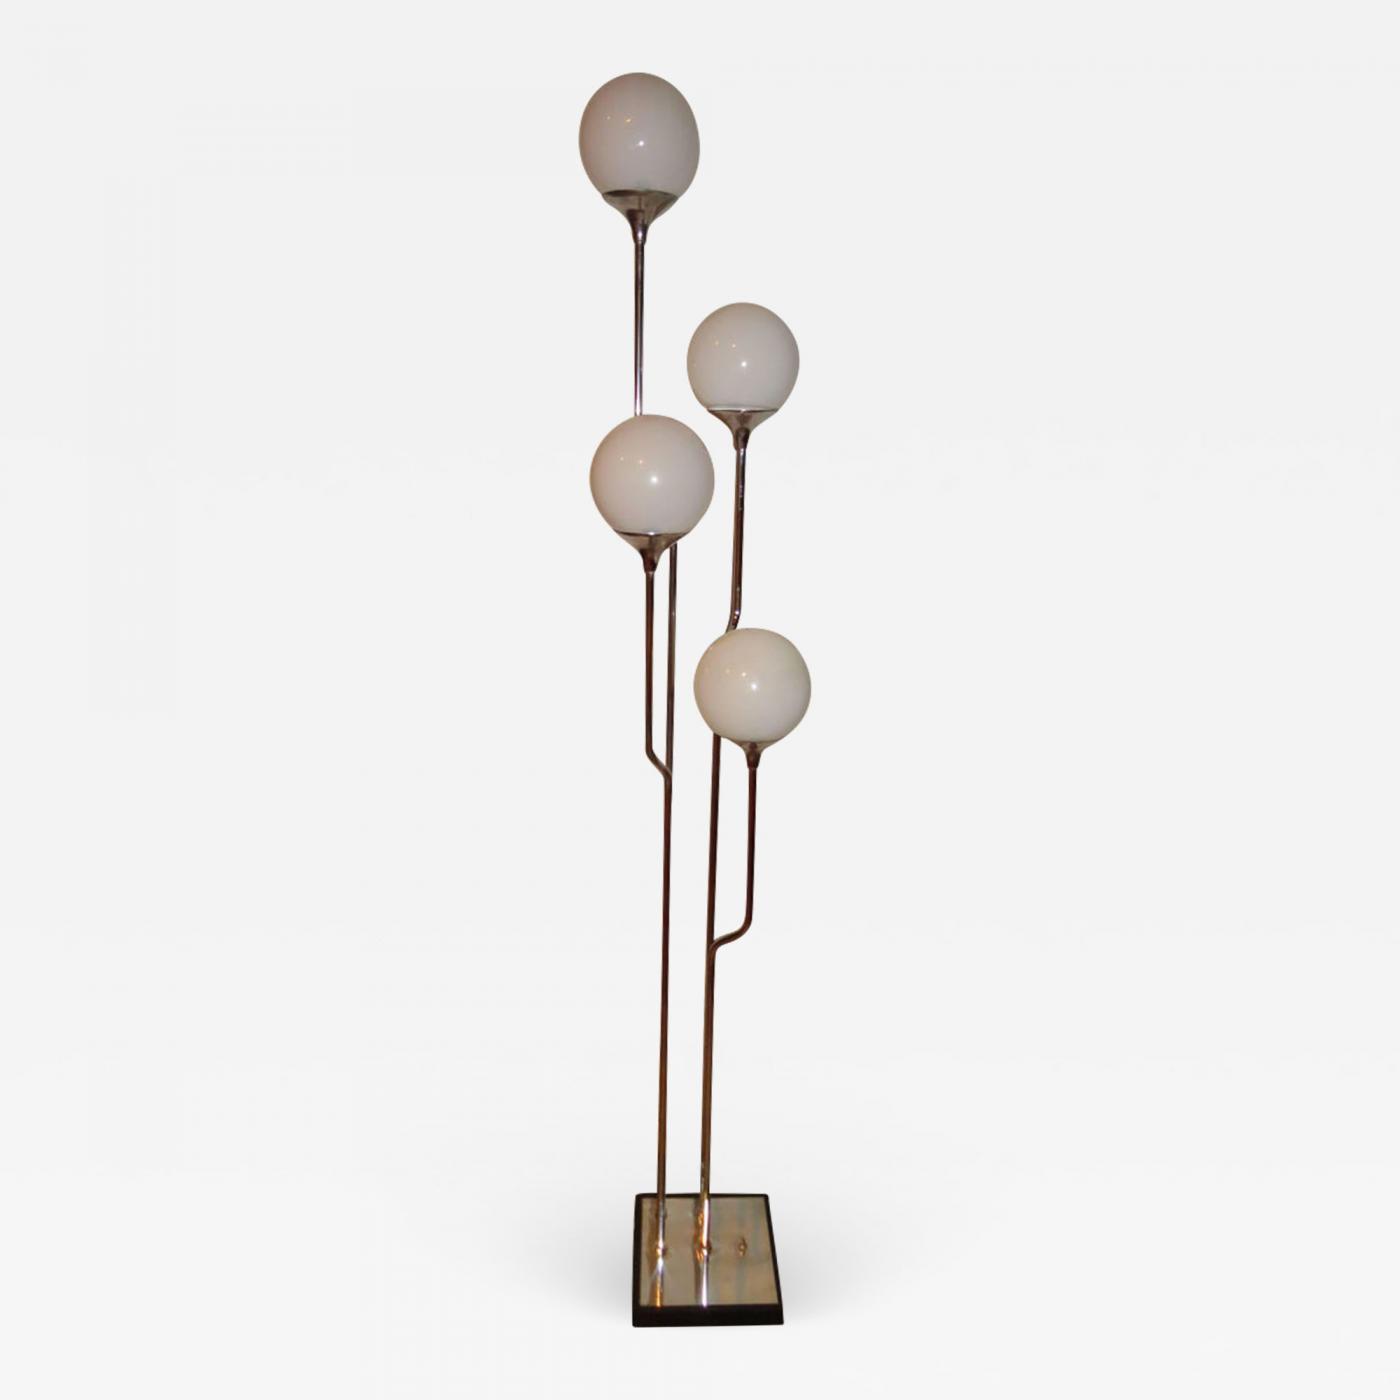 Goffredo Reggiani Stunning 1960s Italian Goffredo Reggiani Chrome Floor Lamp Mid Century Modern